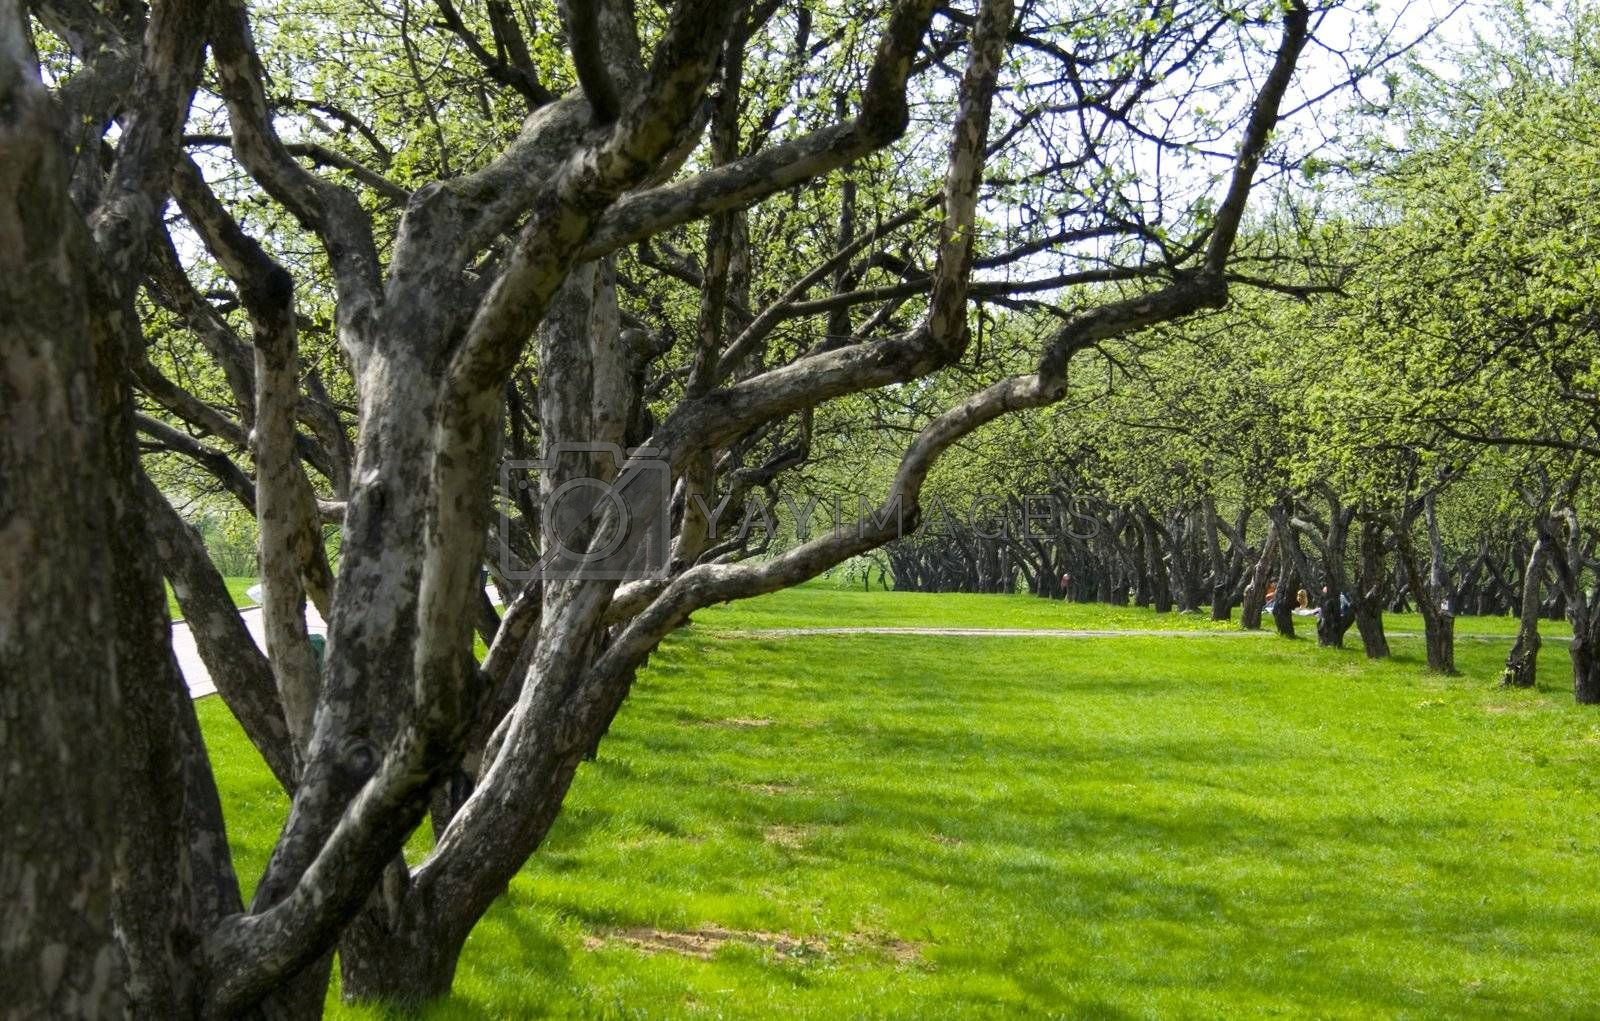 spring garden with green grass